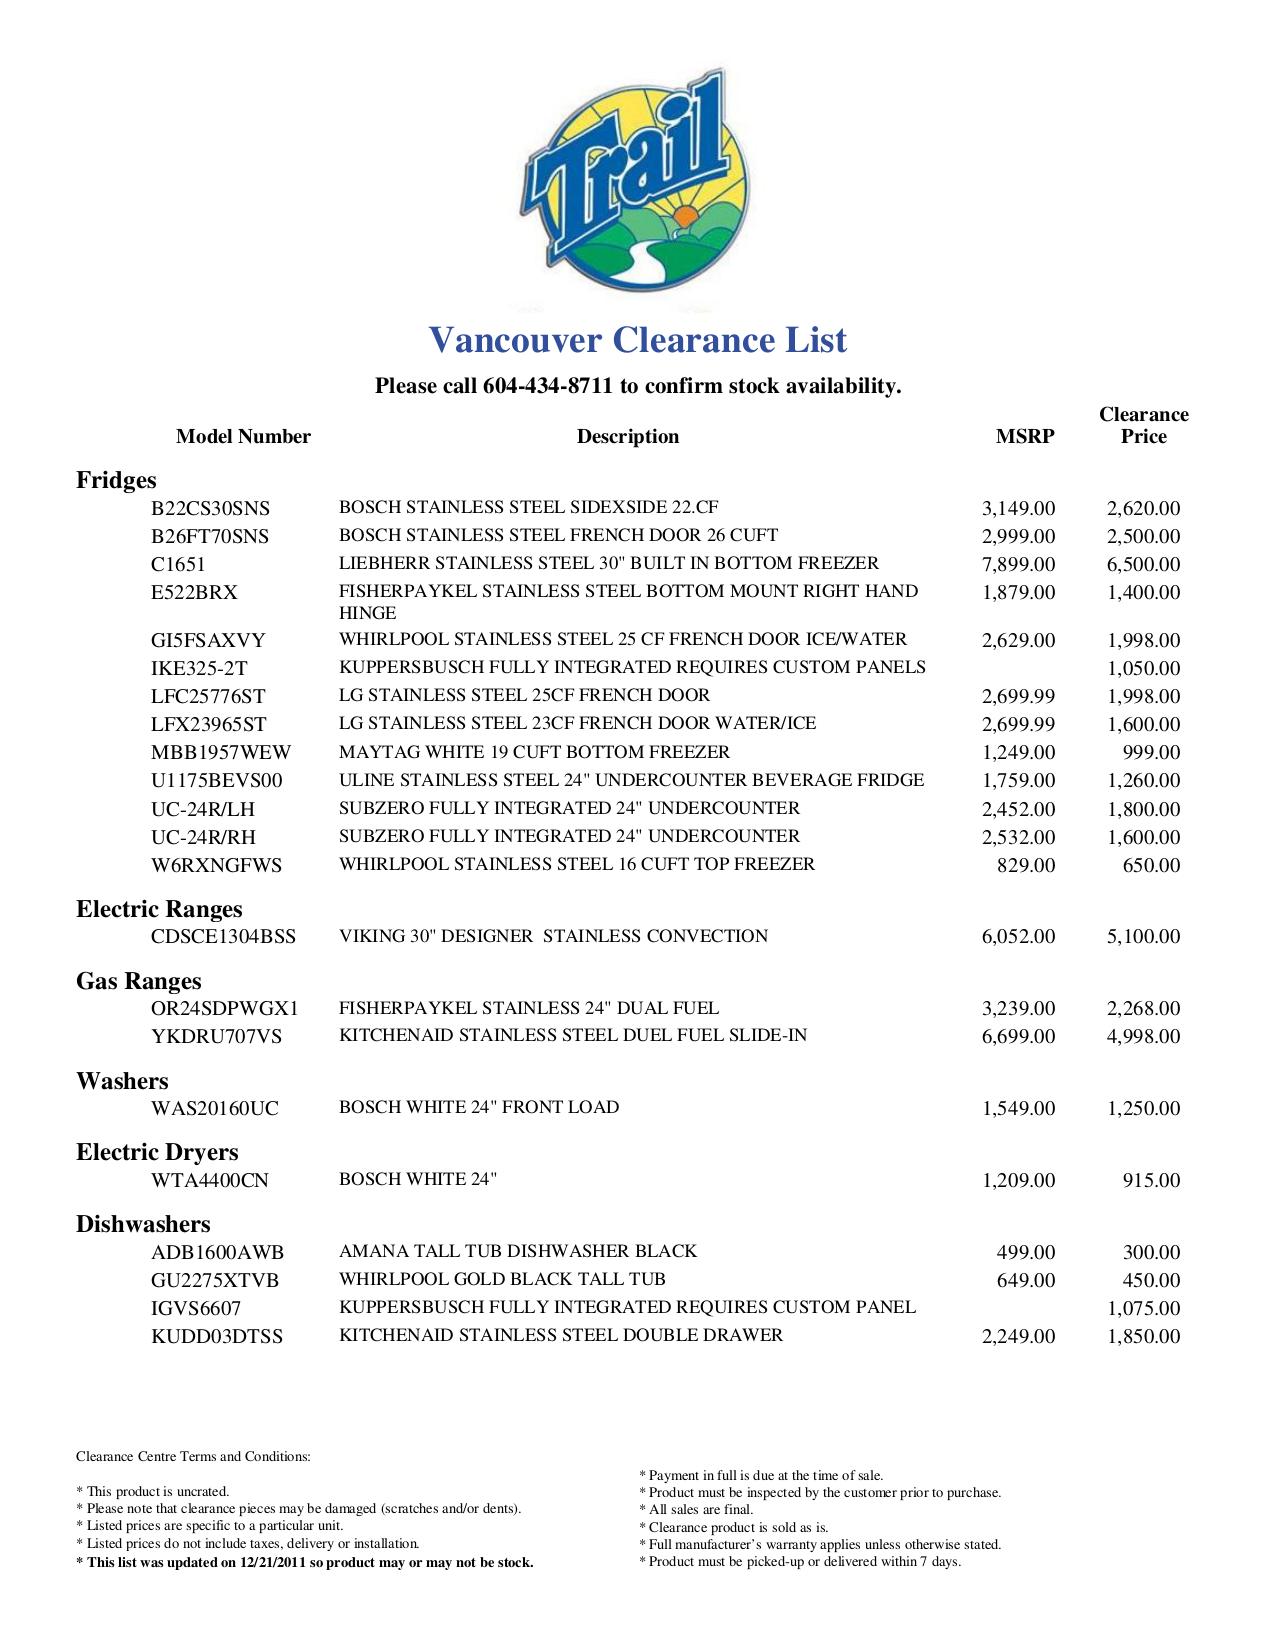 pdf for Kuppersbusch Range GKS6740.0M manual